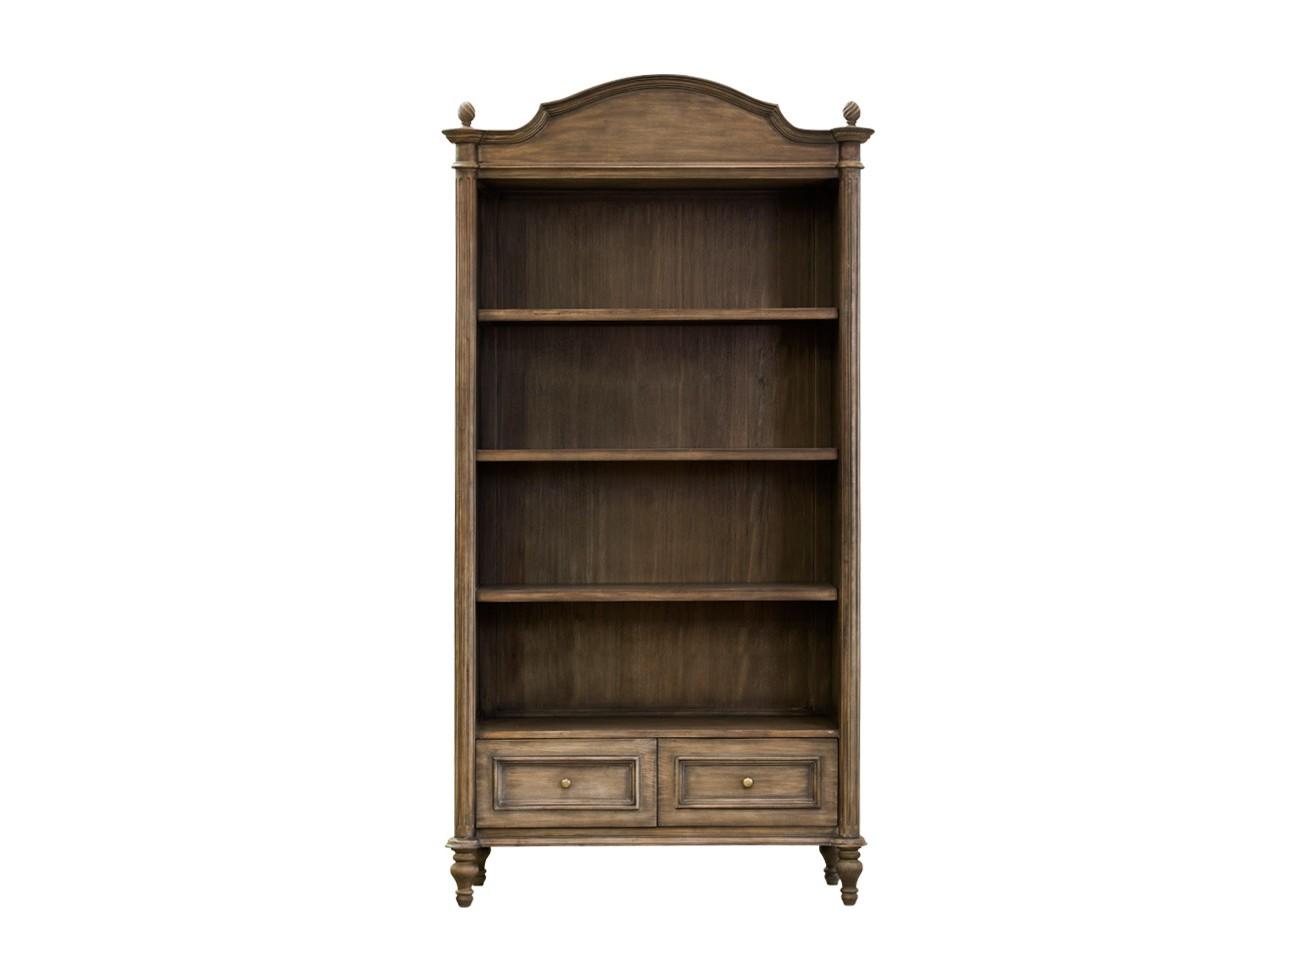 Книжный шкаф Lucas BookcaseКнижные шкафы и библиотеки<br><br><br>kit: None<br>gender: None